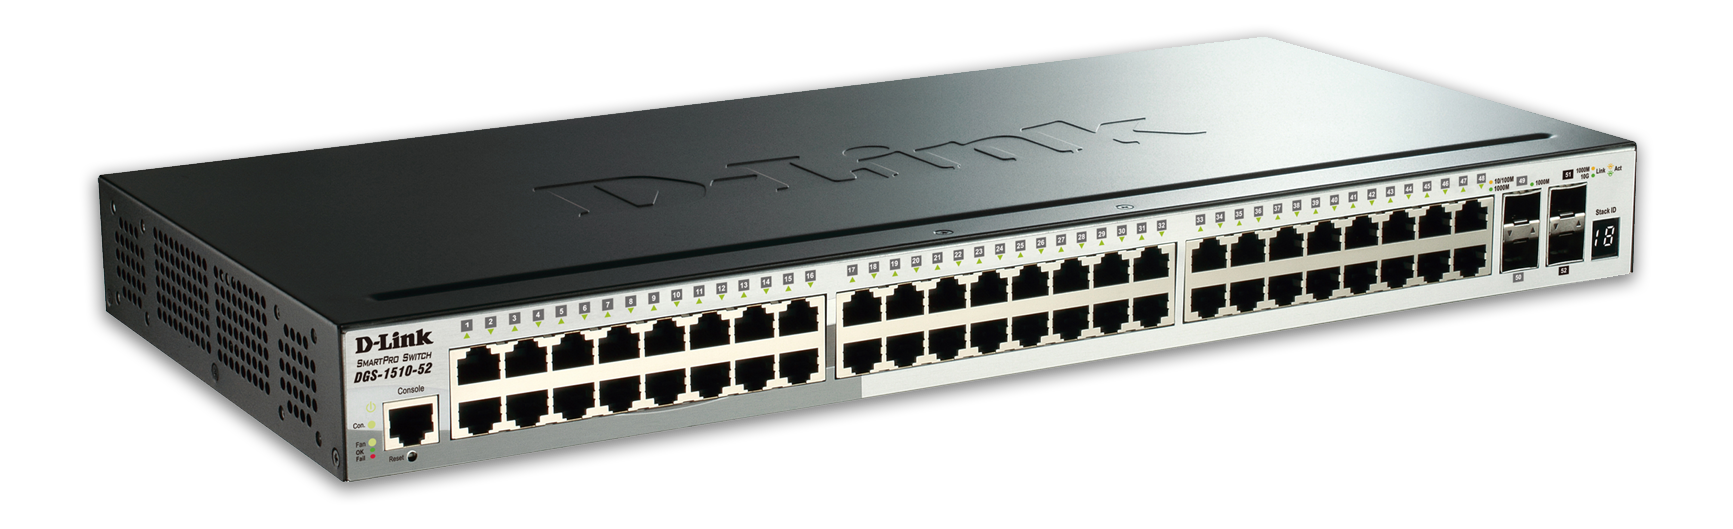 D-Link Gigabit Stackable SmartPro nätverksswitch, 48xRJ45, 4xSFP, PoE